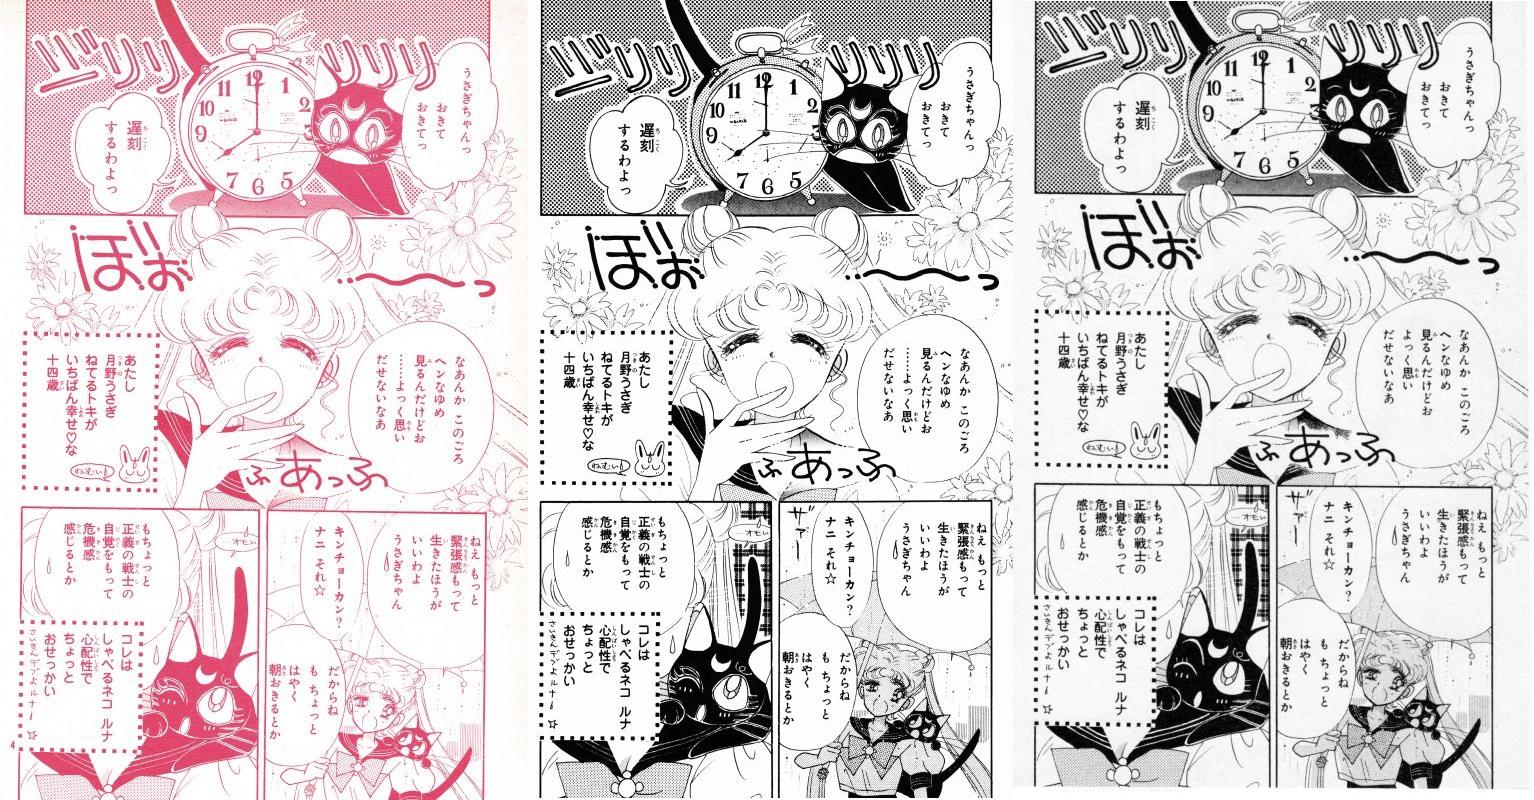 Act 5, Page 2 – Nakayoshi, Original, Remaster